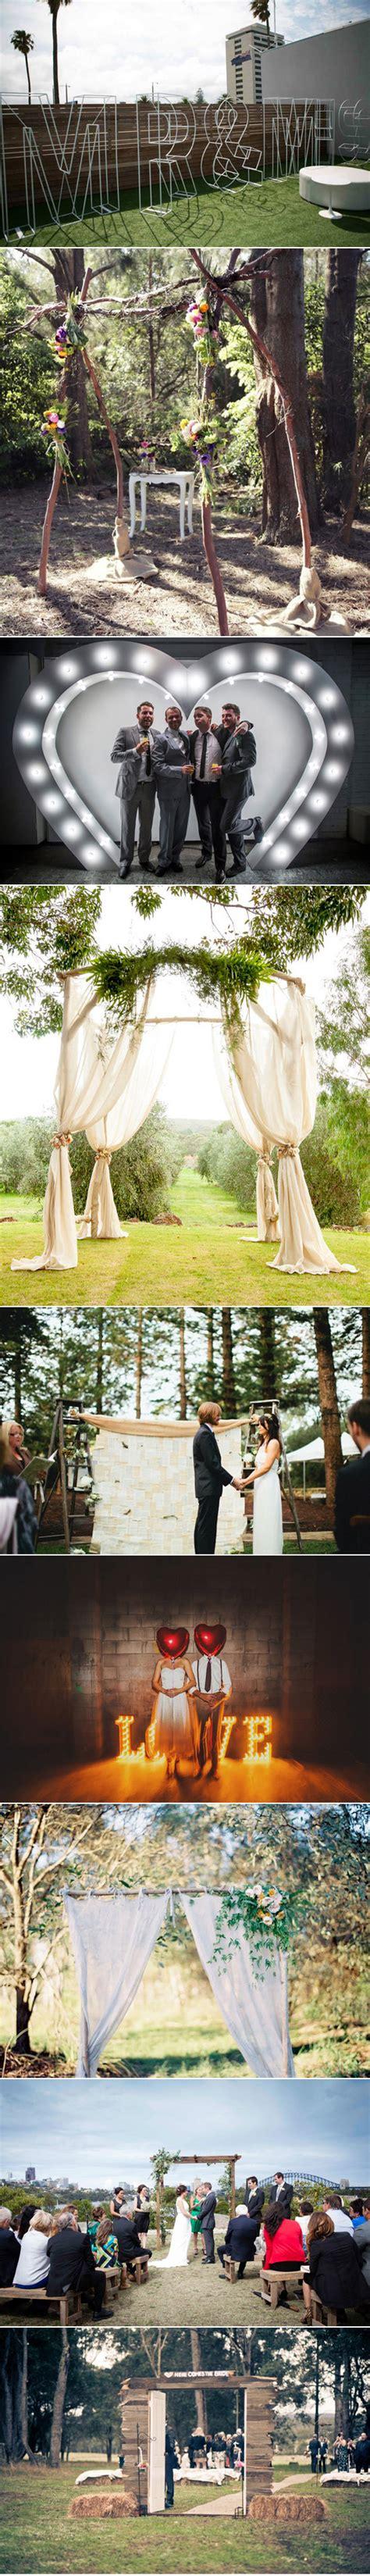 Wedding Backdrop Australia big bold wedding backdrops polka dot